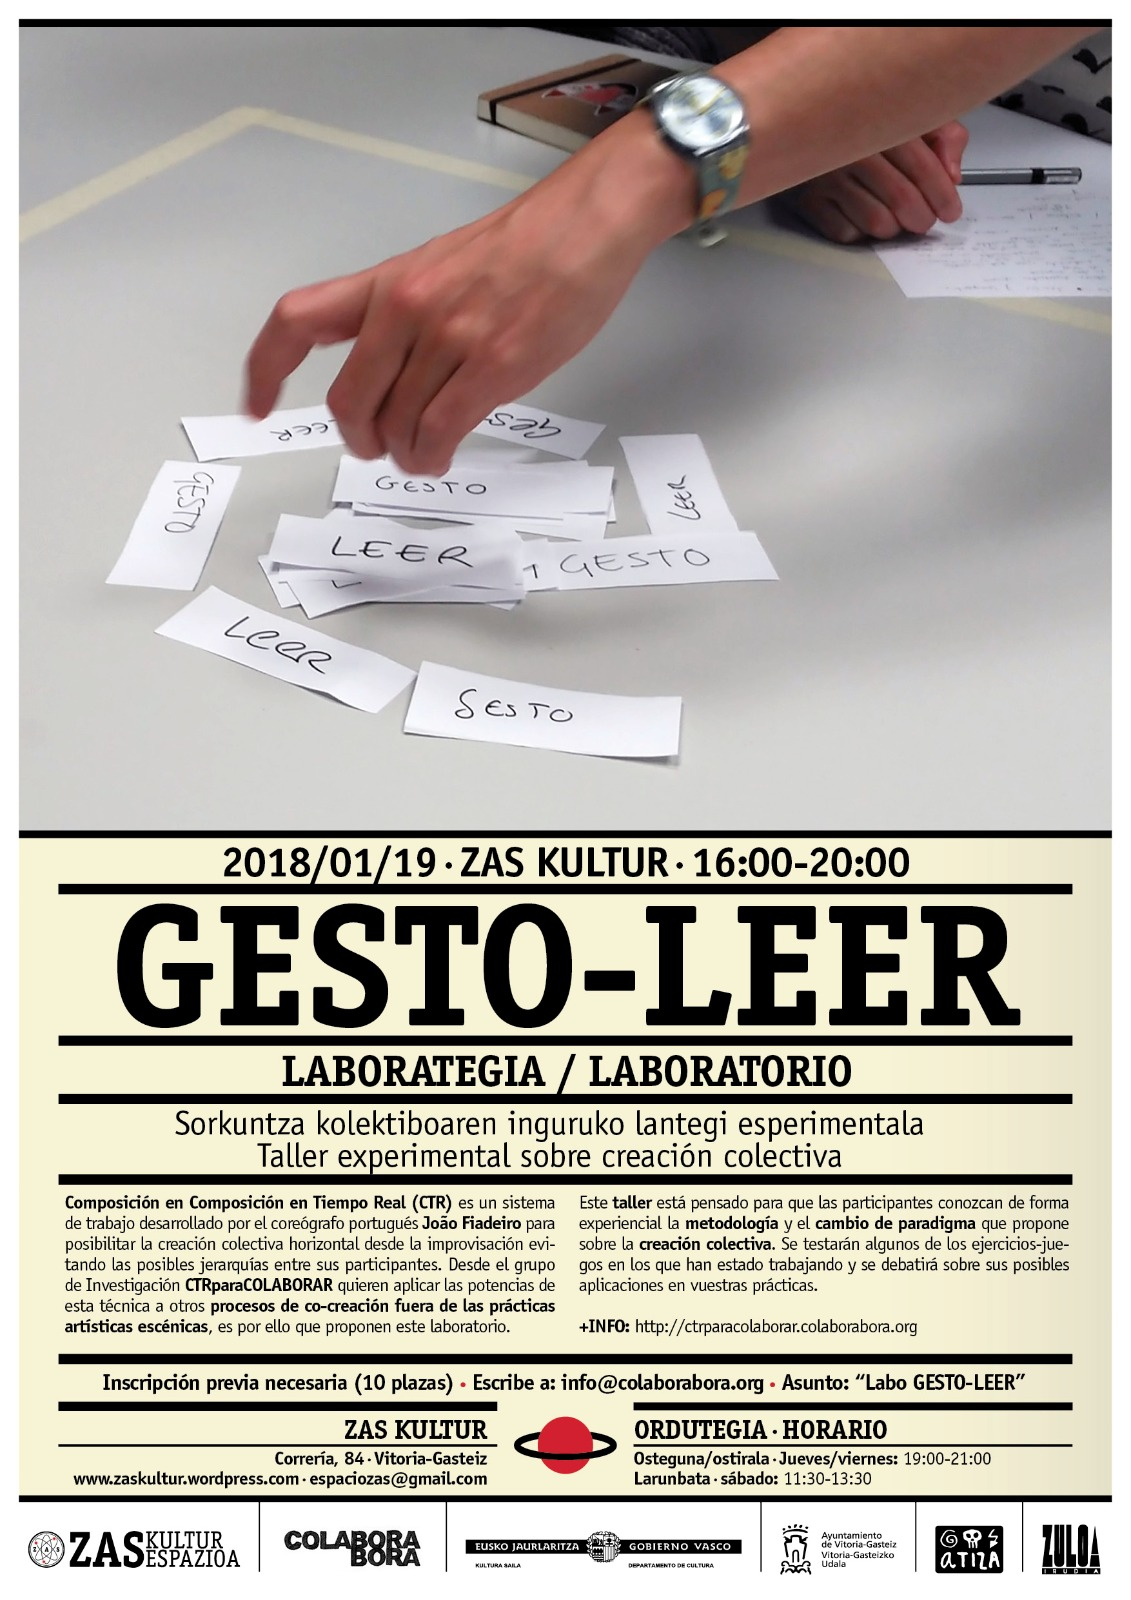 Laboratorio GESTO-LEER